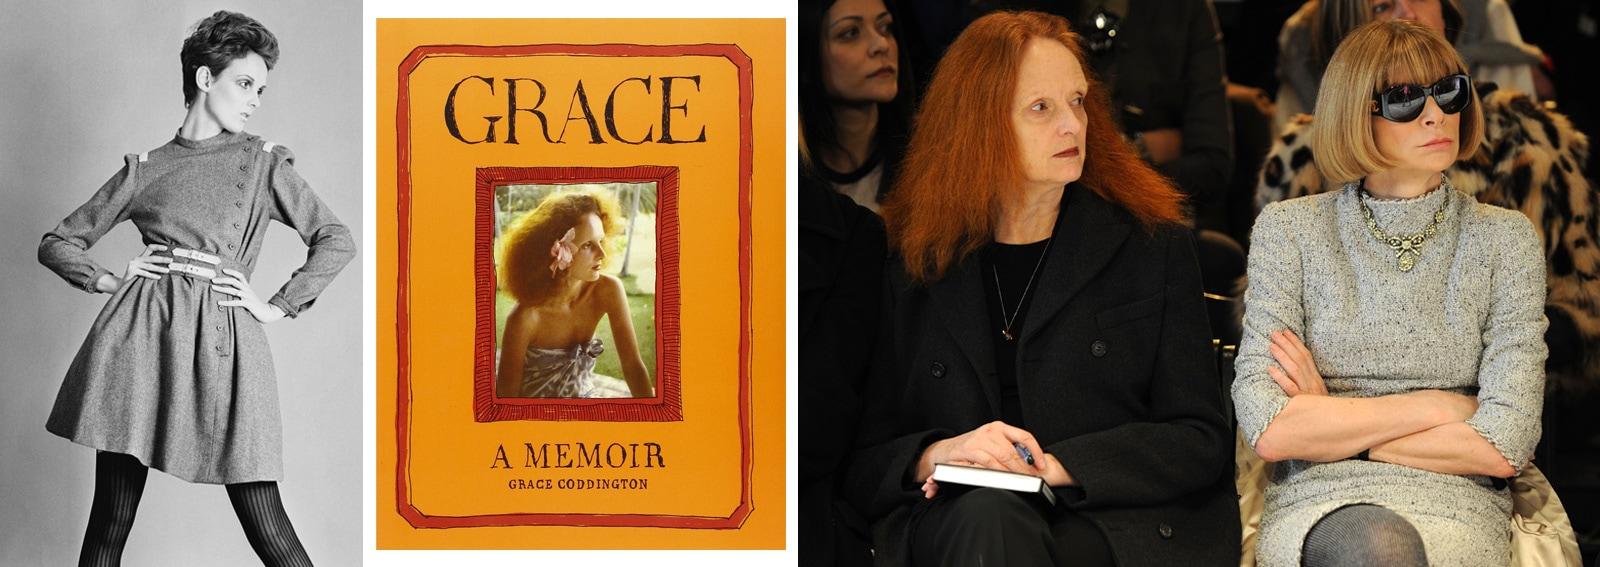 COVER-Grace-Coddington-DESKTOp